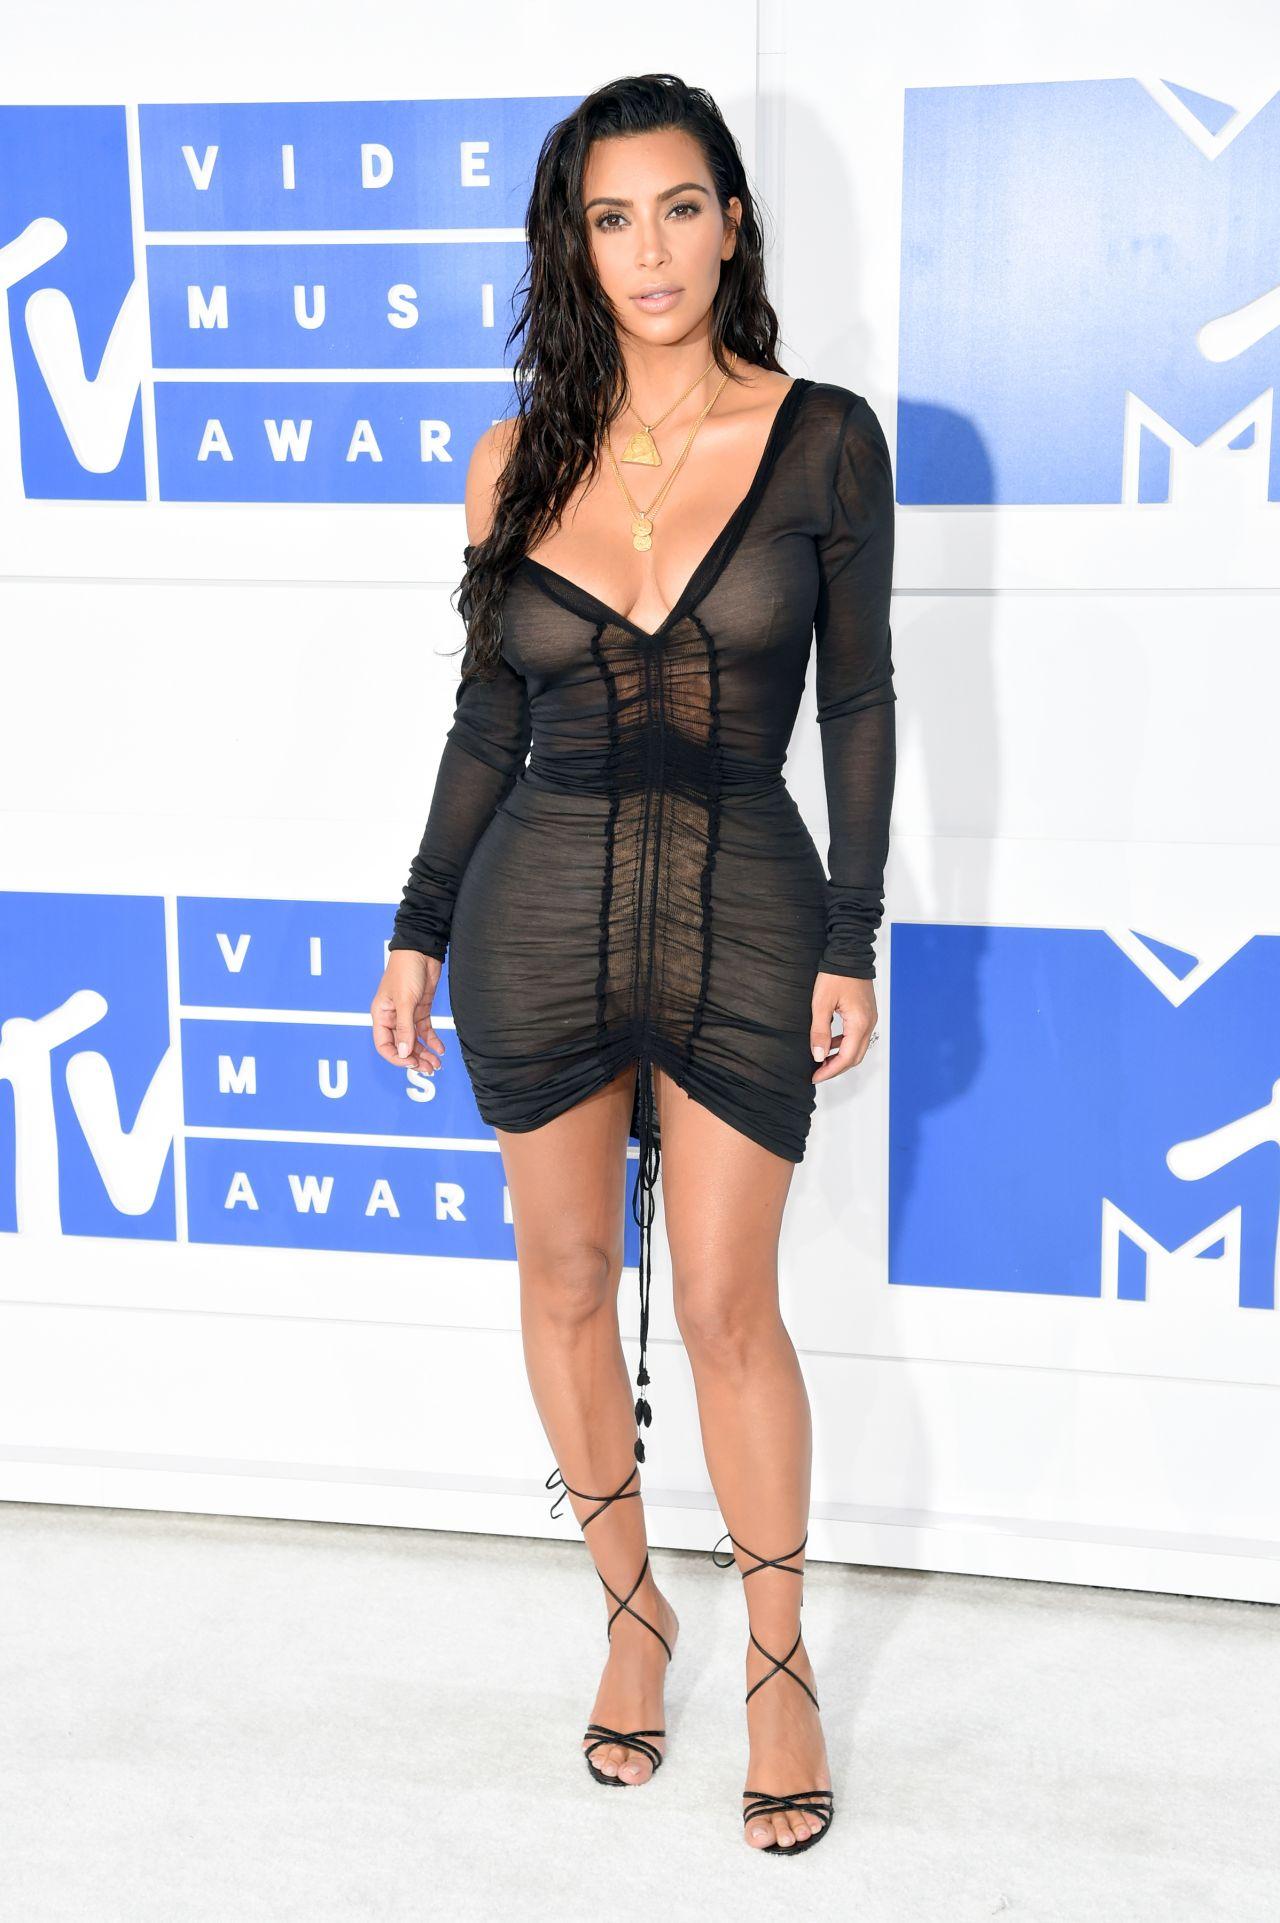 Kim Kardashian Mtv Video Music Awards 2016 In New York City 8 28 2016